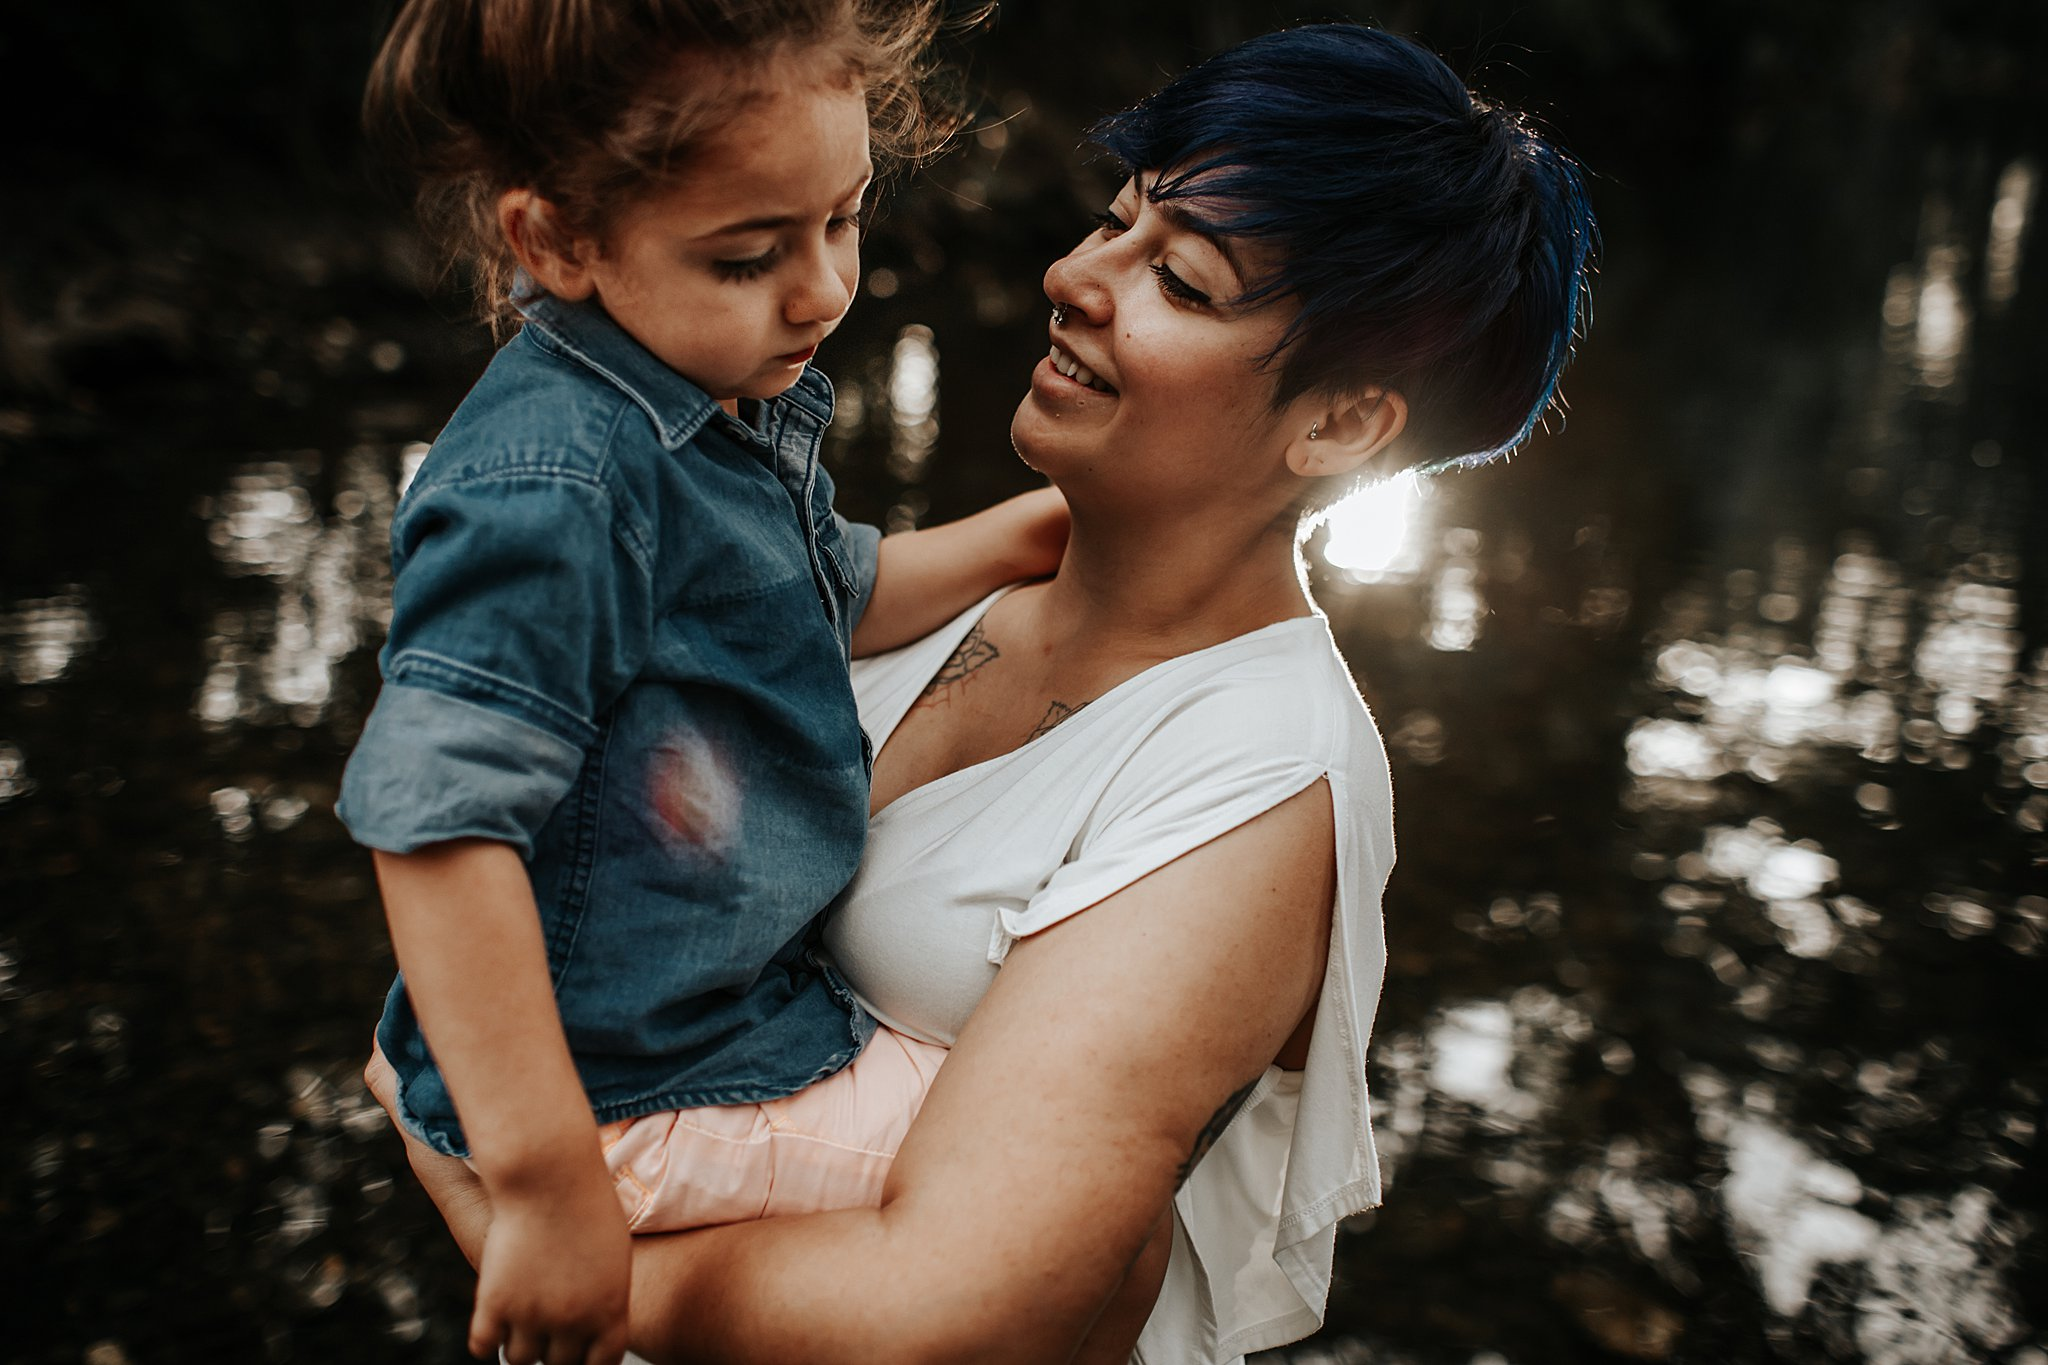 Meagan-San-Antonio-Maternity-Photographer-10_WEB.jpg